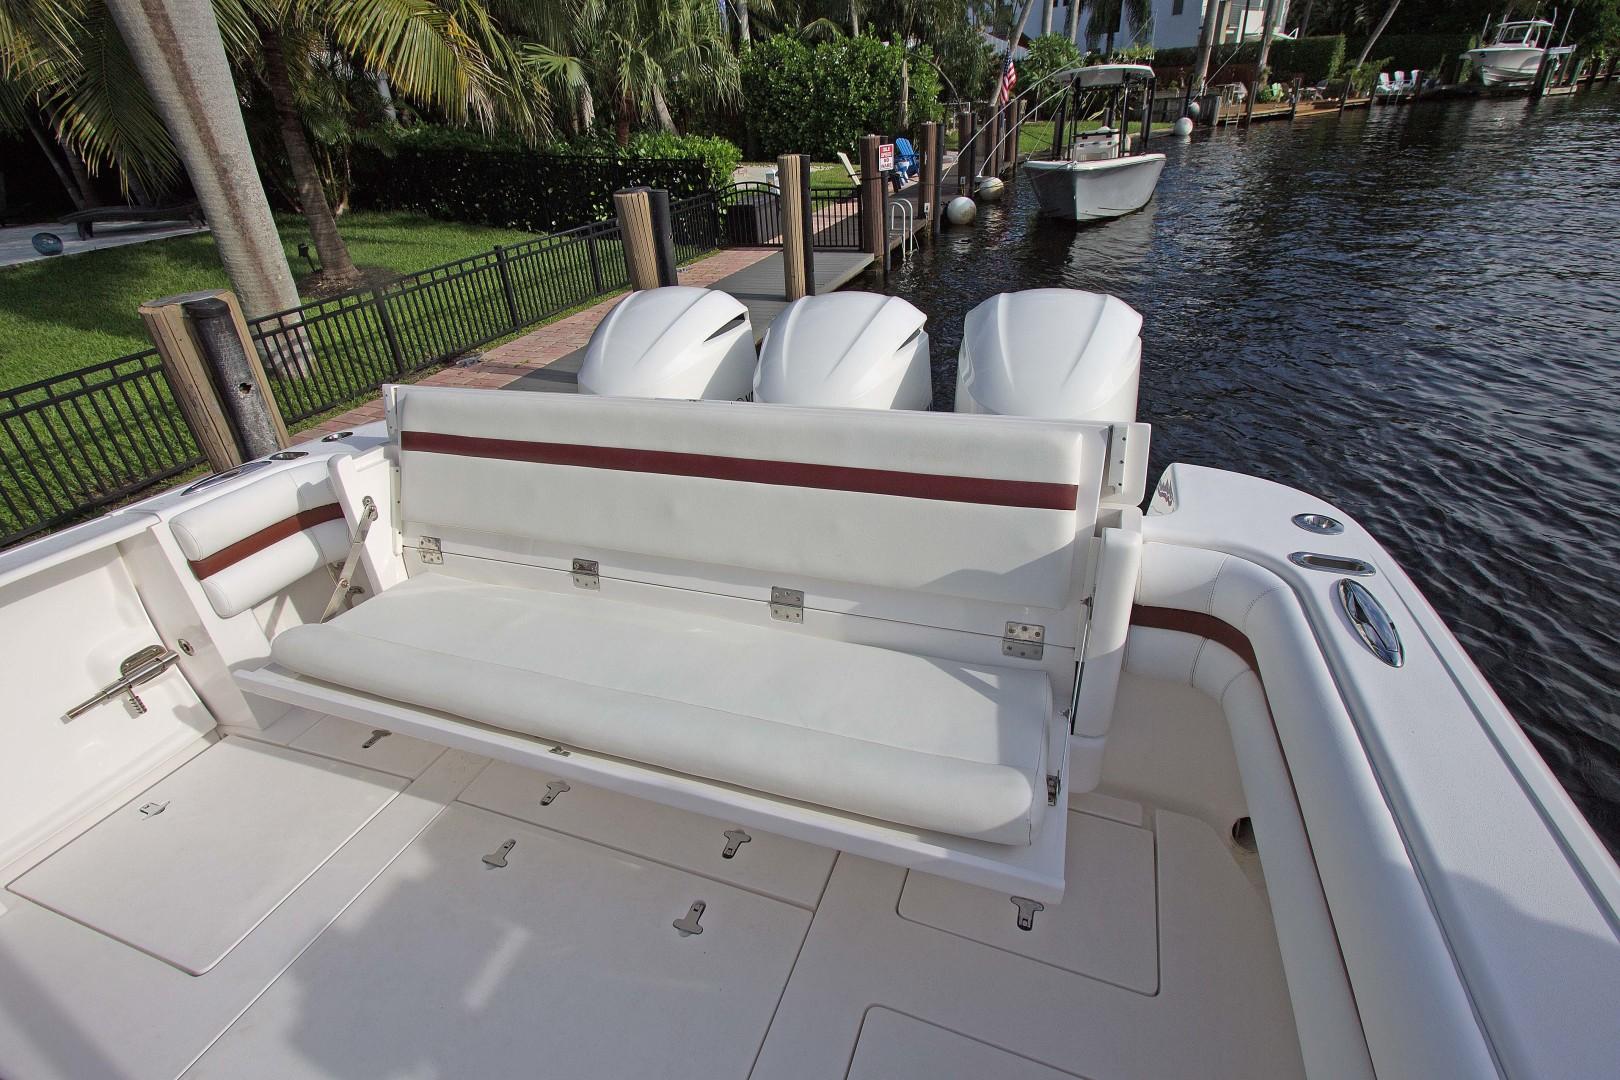 Intrepid-375 Walkaround 2014-NN 375 Walkaround 2014 Fort Lauderdale-Florida-United States-1507844 | Thumbnail